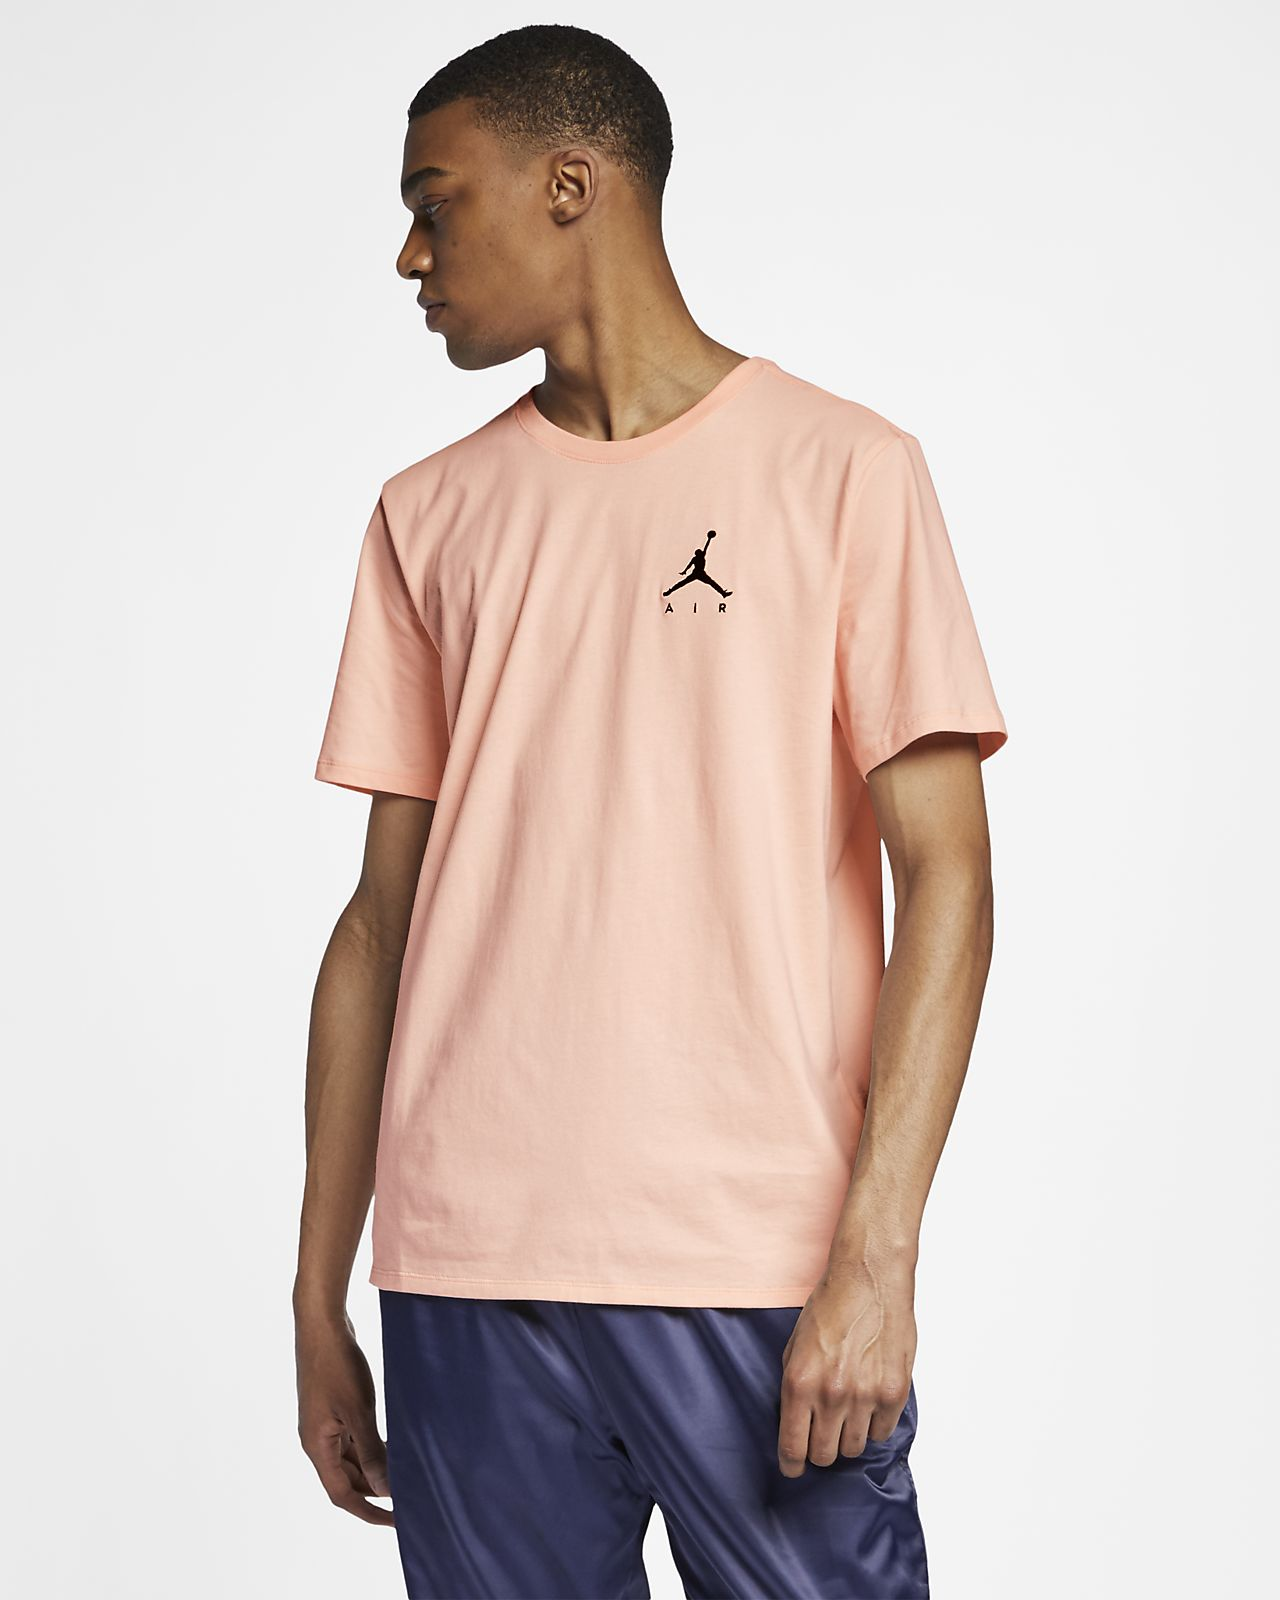 257848fe0489 jordan-sportswear-jumpman-air-herren-t-shirt-725STw.jpg